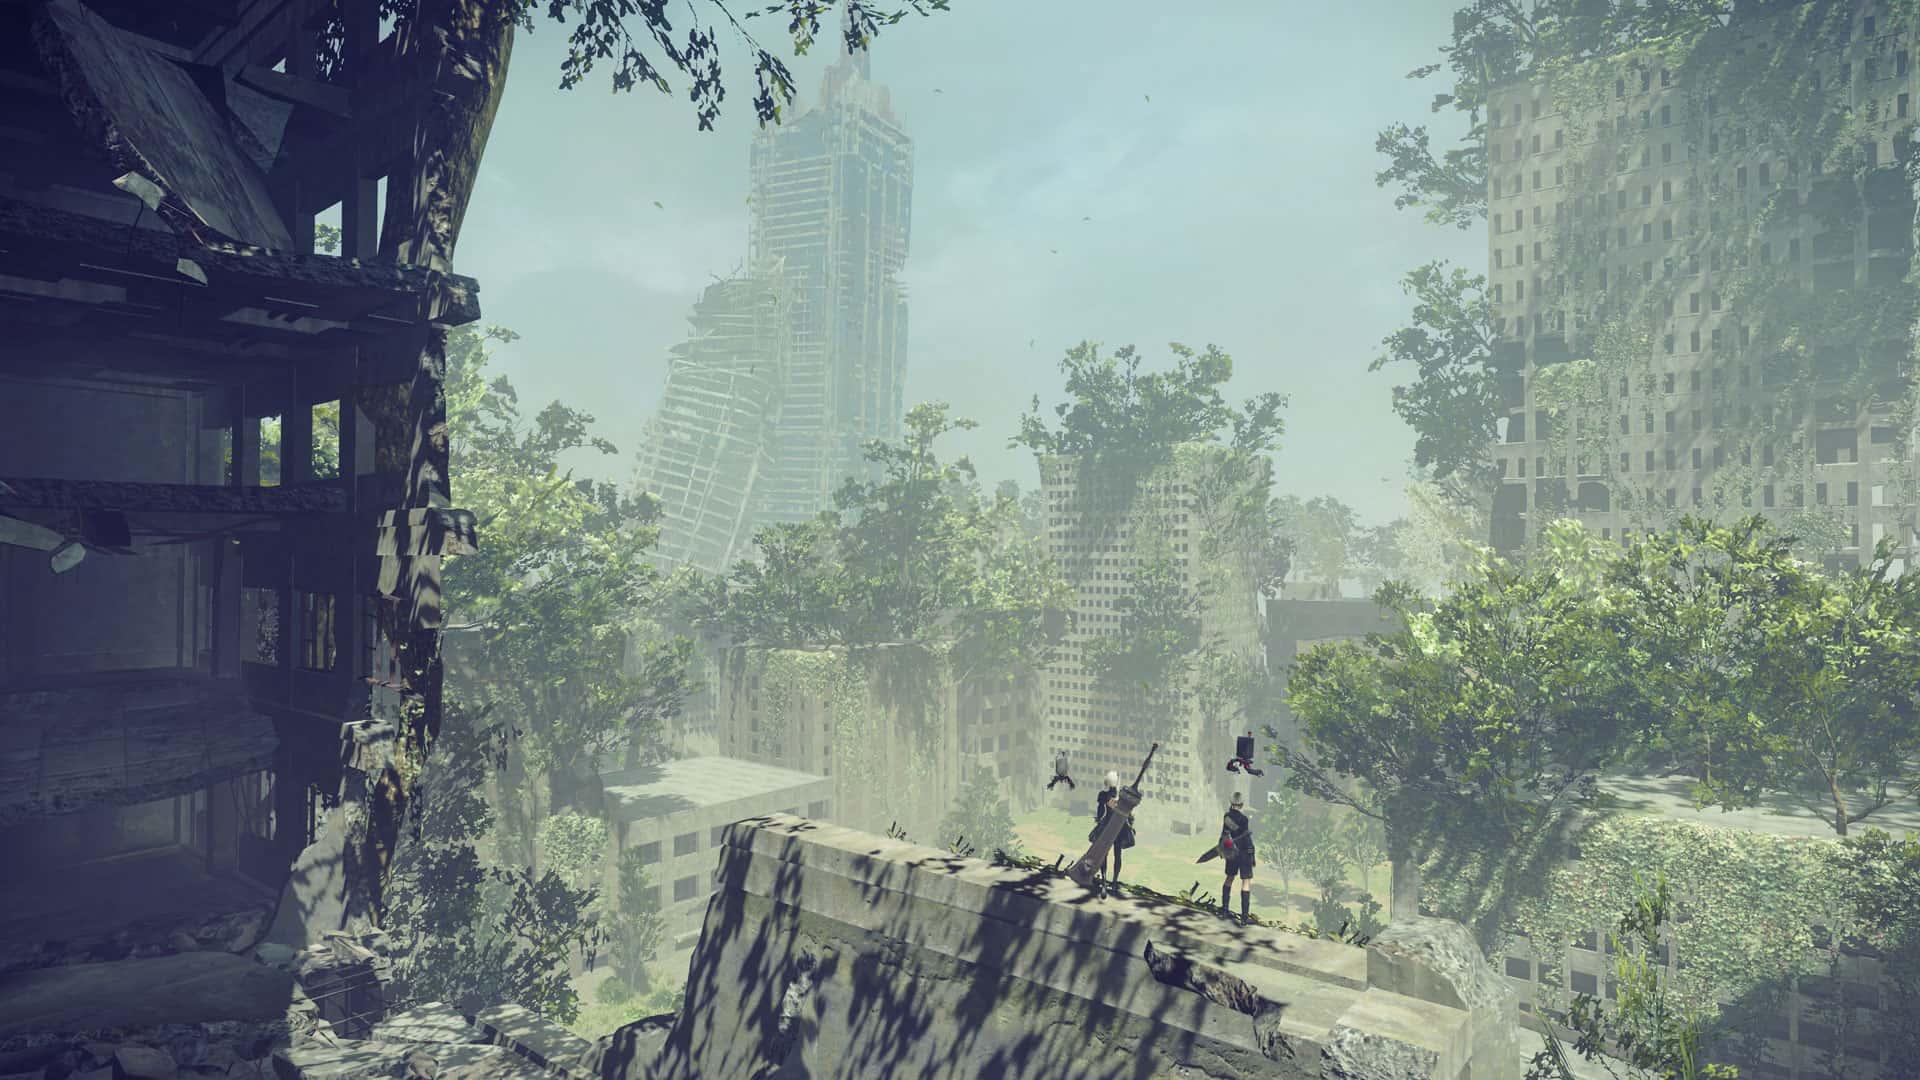 city_ruins-min